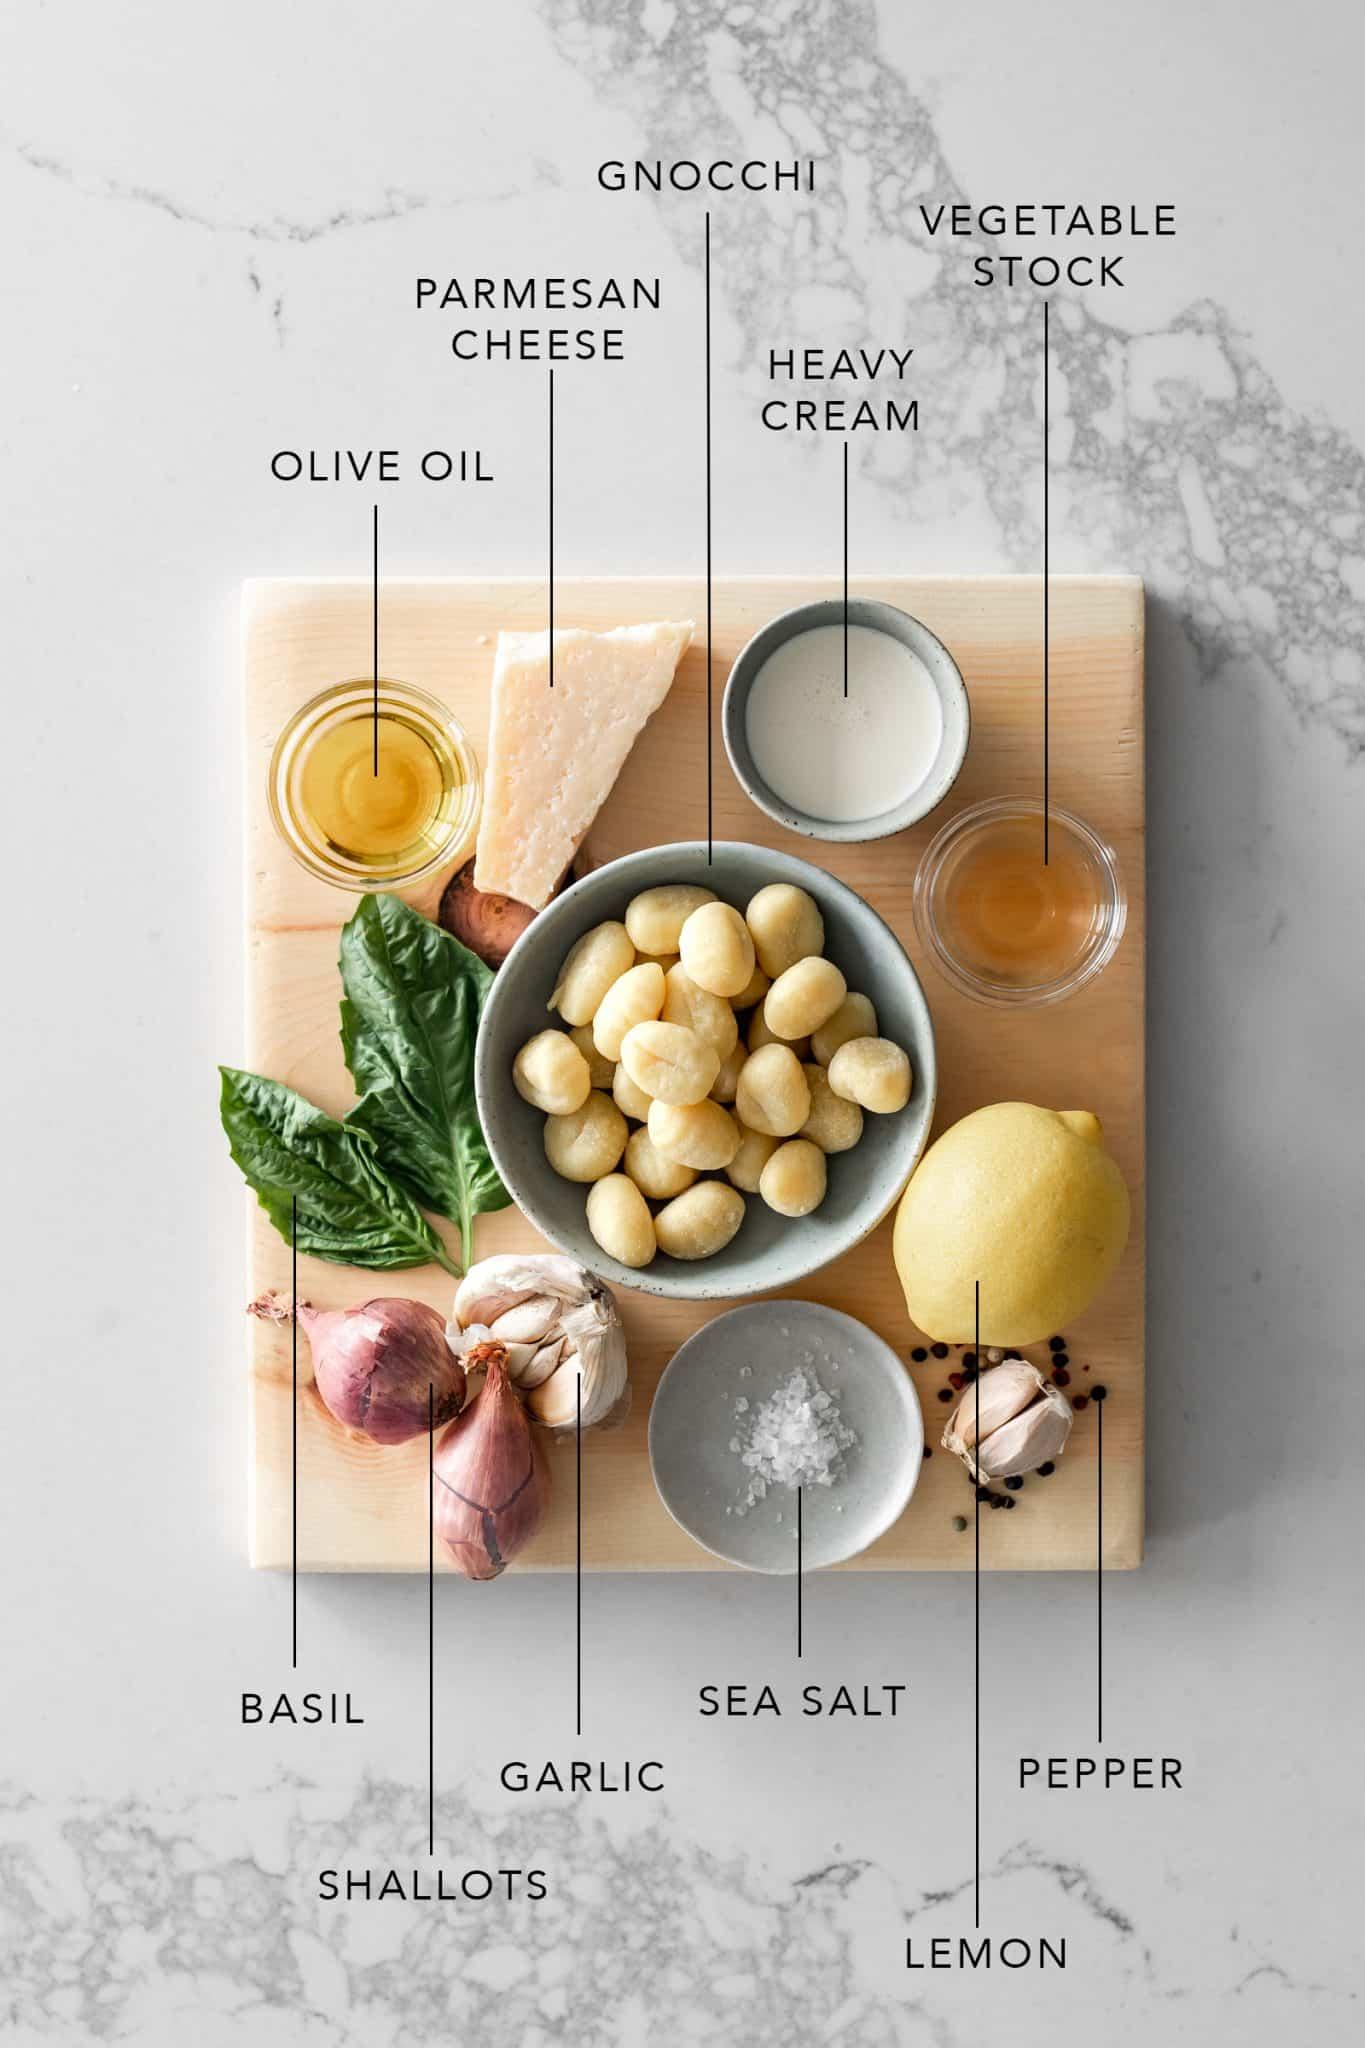 Wood board with olive oil, parmesan, gnocchi, cream, vegetable stock, basil, shallots, garlic, sea salt, lemon and peppercorns